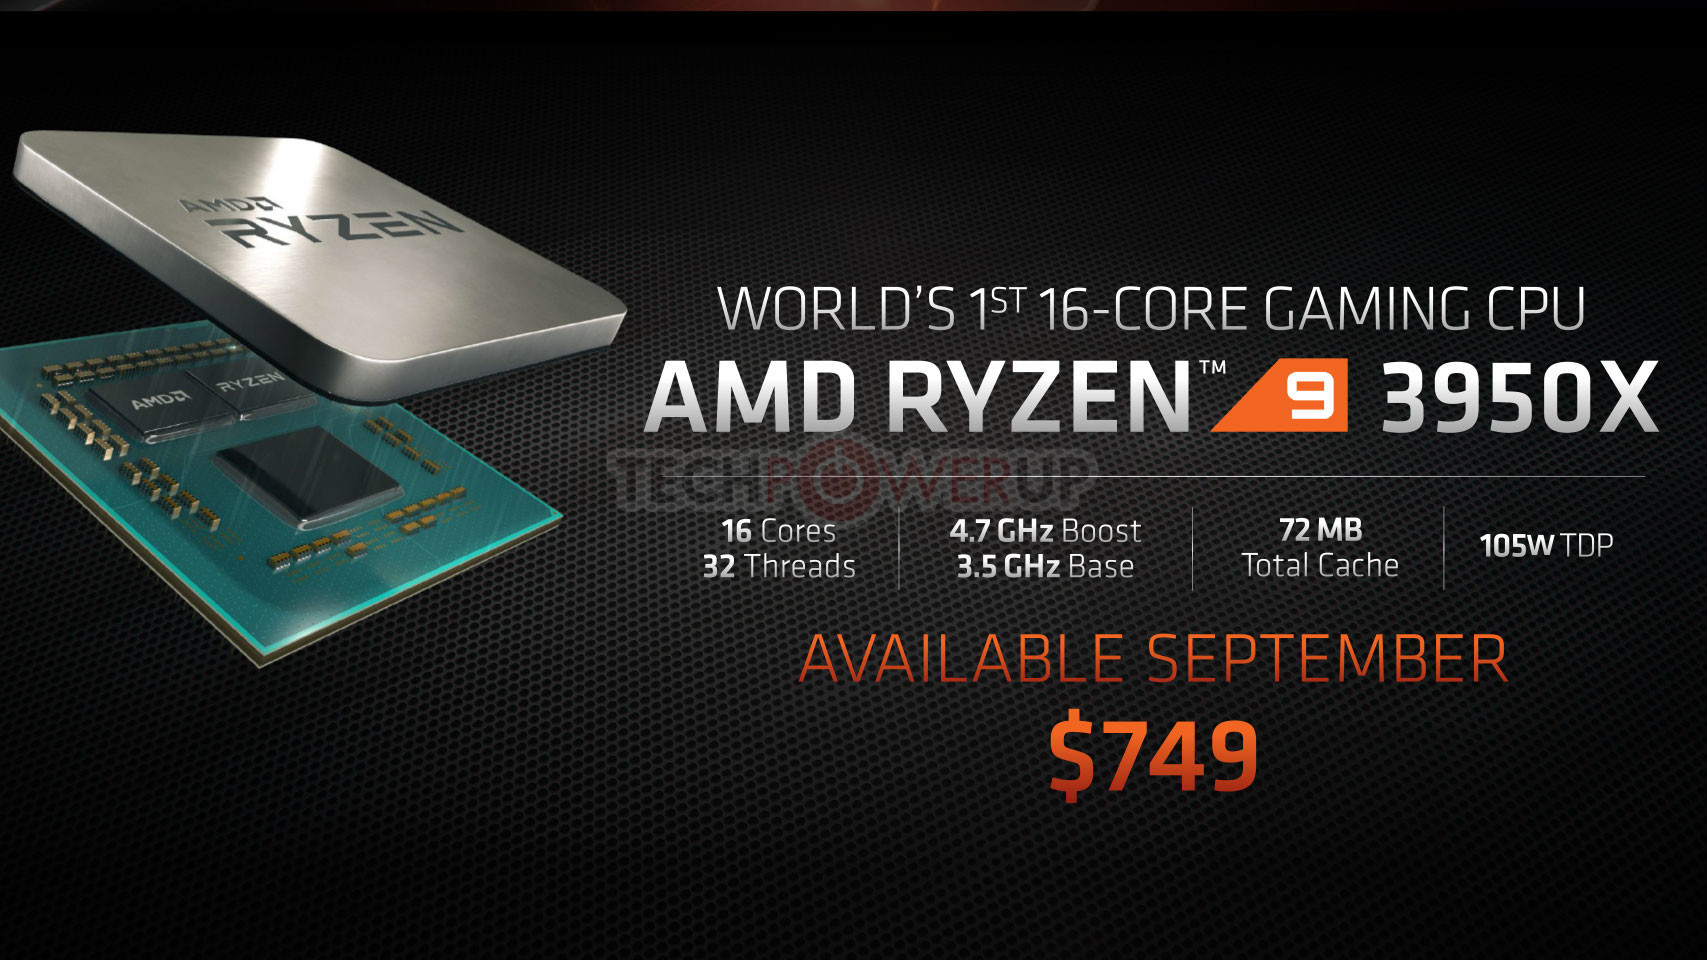 Giá AMD Ryzen 9 3950X là 749USD